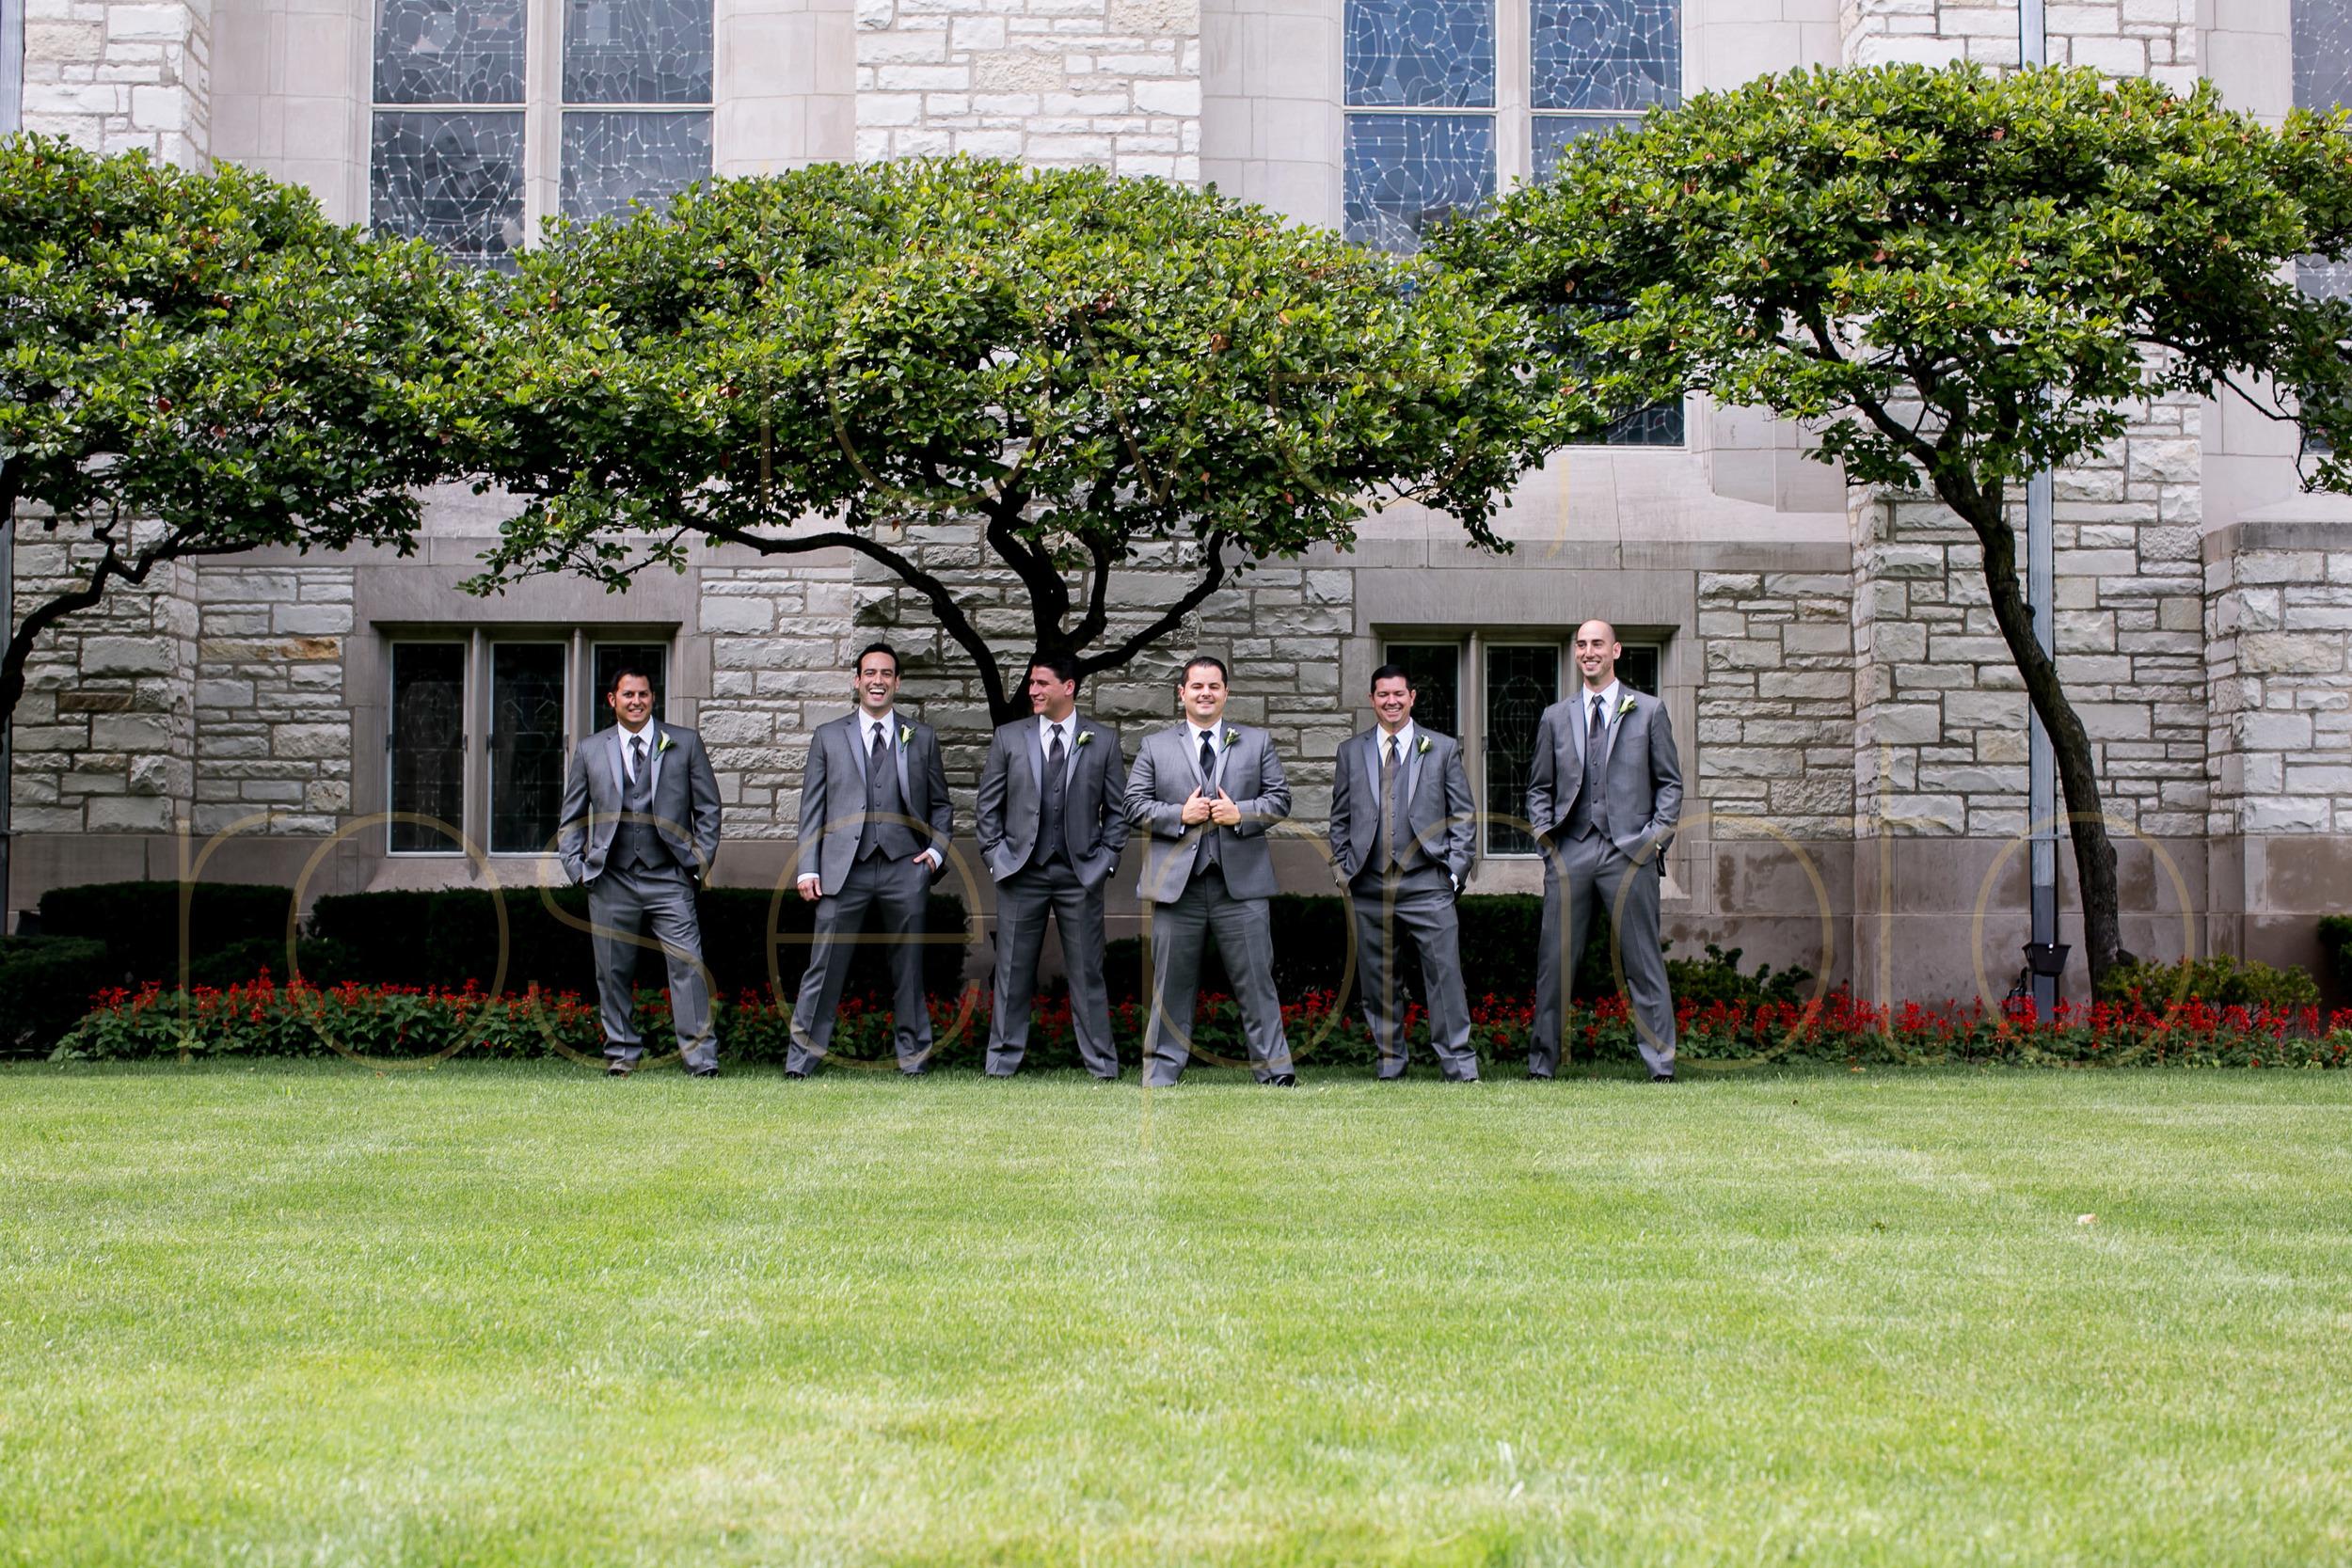 chicago photographer destination wedding best of the knot big day photos Salvatore's Lincoln Park -20.jpg